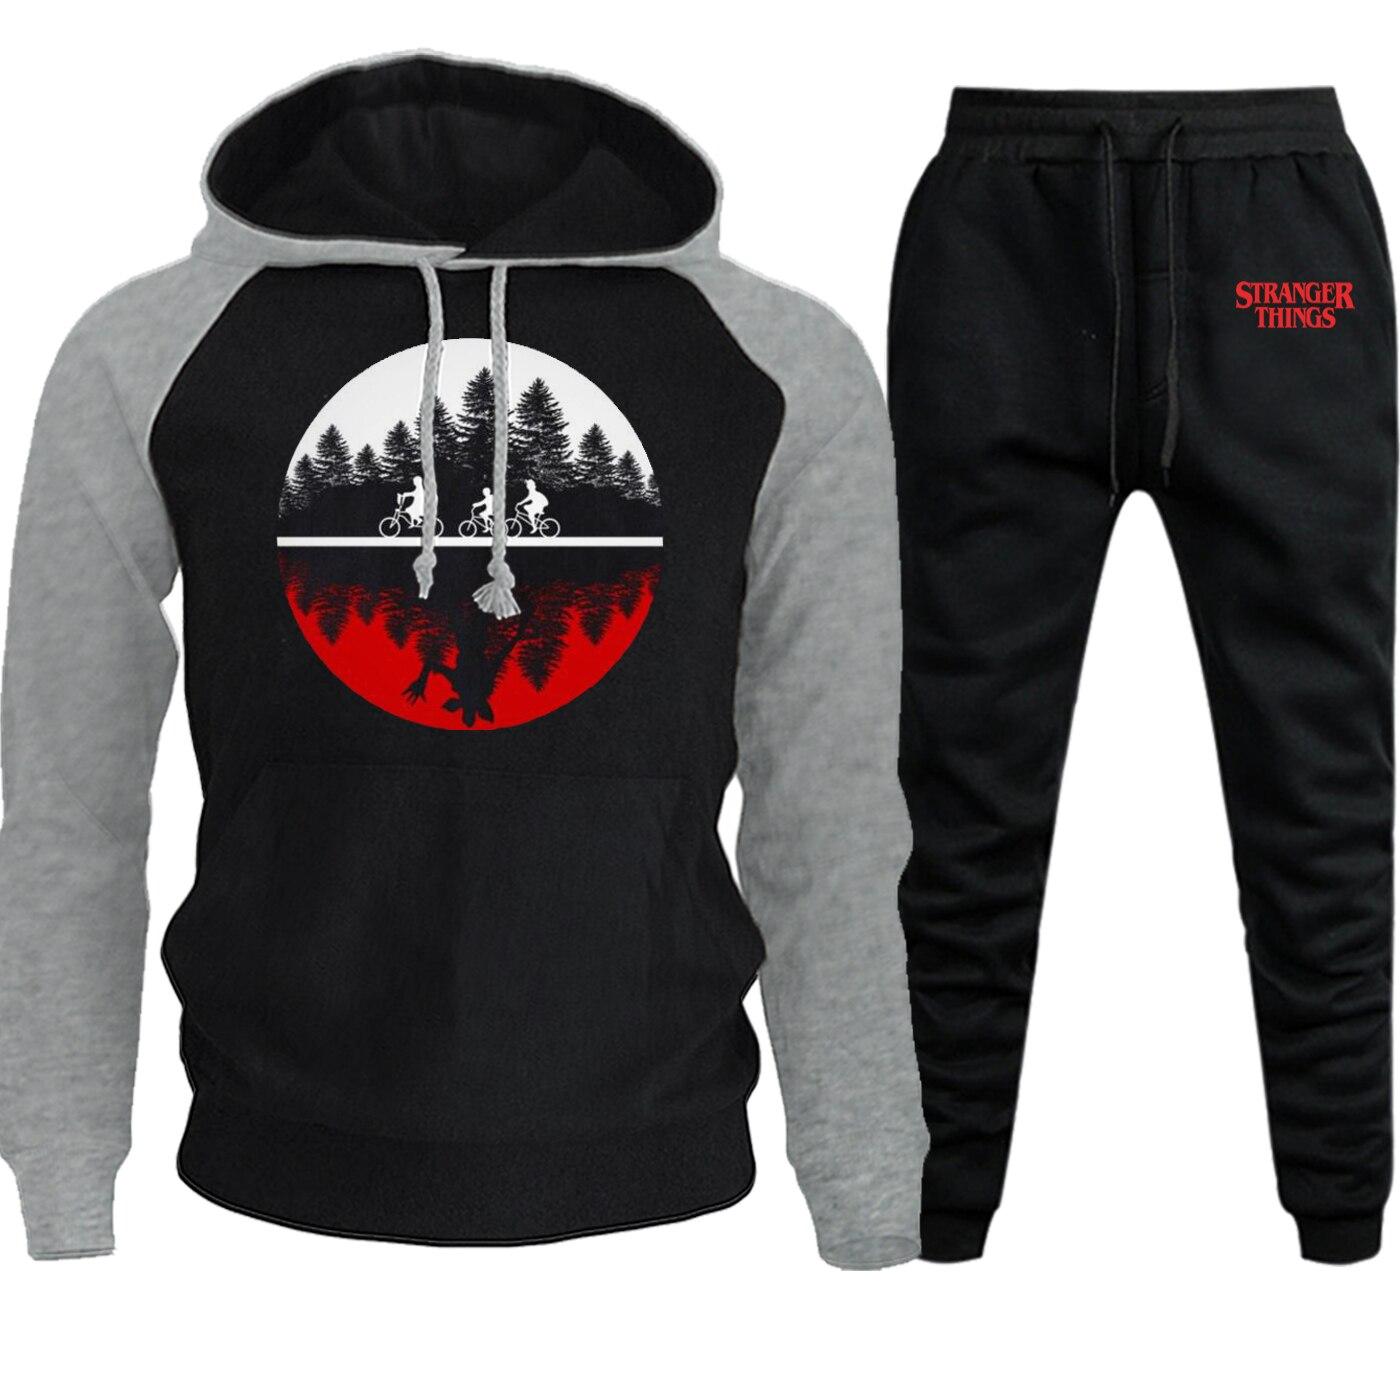 Stranger Things Printed Hooded 2019 Autumn Winter Sweatshirts Raglan Mens Hoodies Funny Suit Casual Pullover+Pants 2 Piece Sets